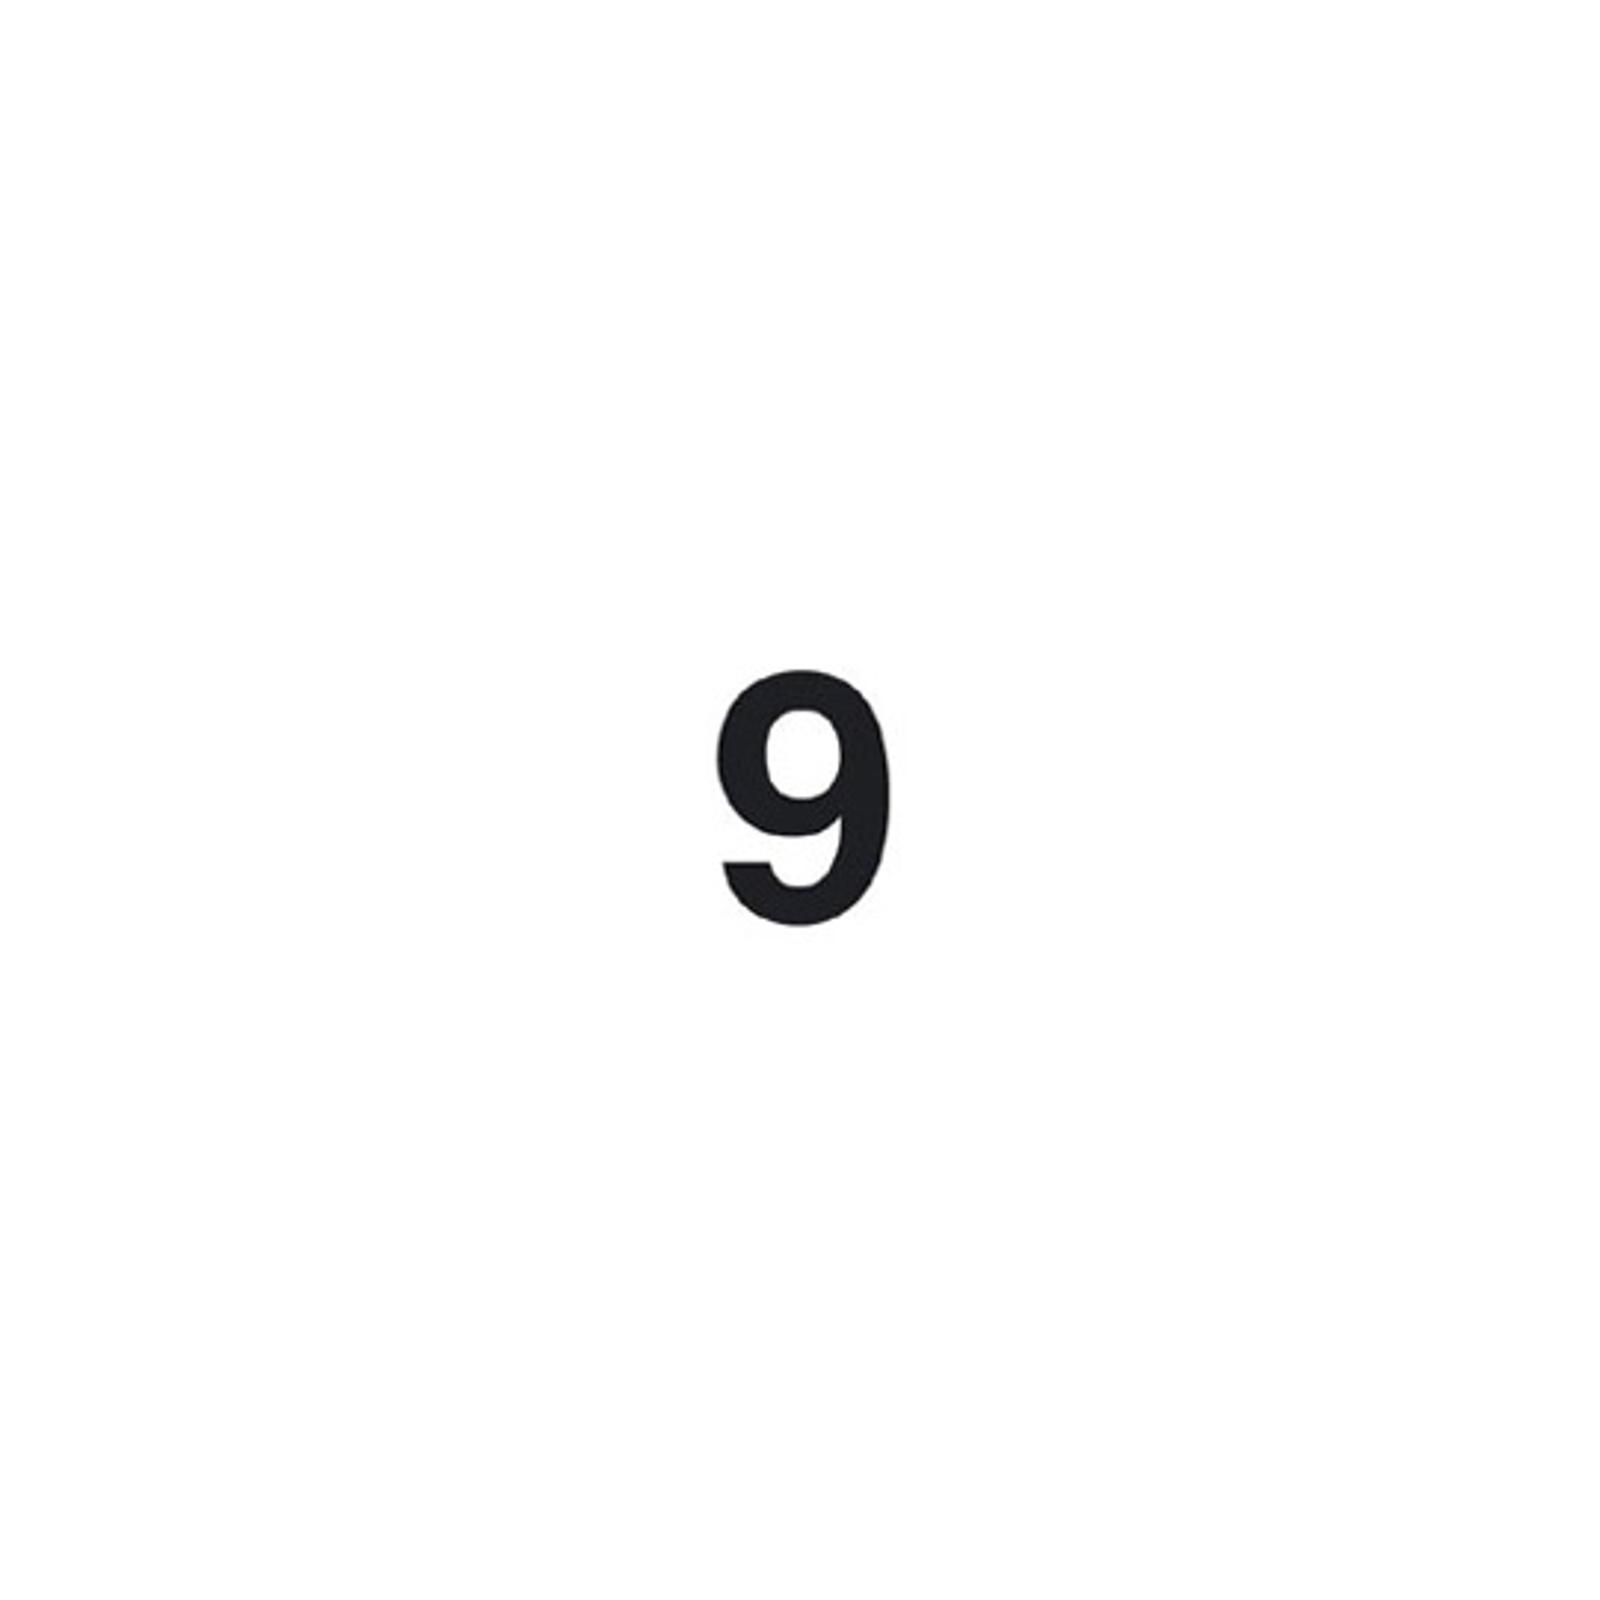 Selbstklebende Ziffer 9